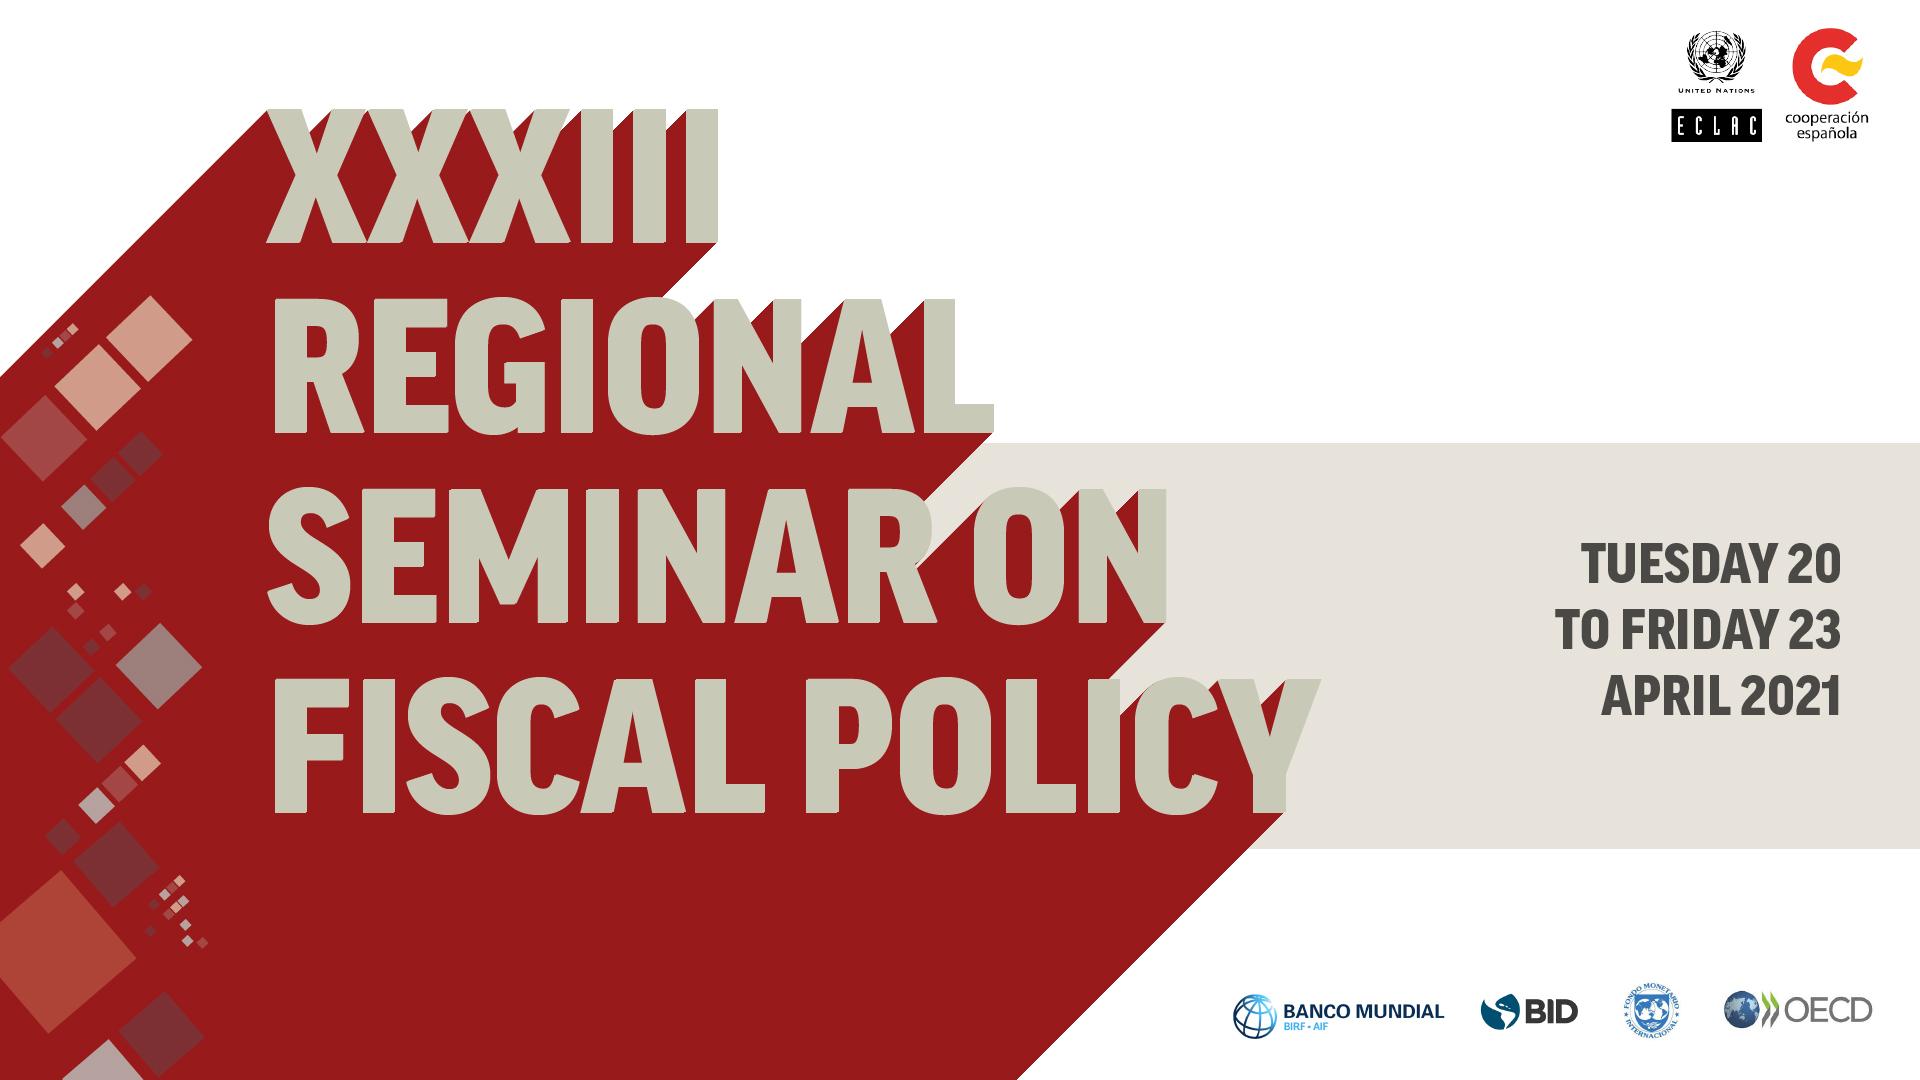 Banner XXXIII Regional Seminar of Fiscal Policy